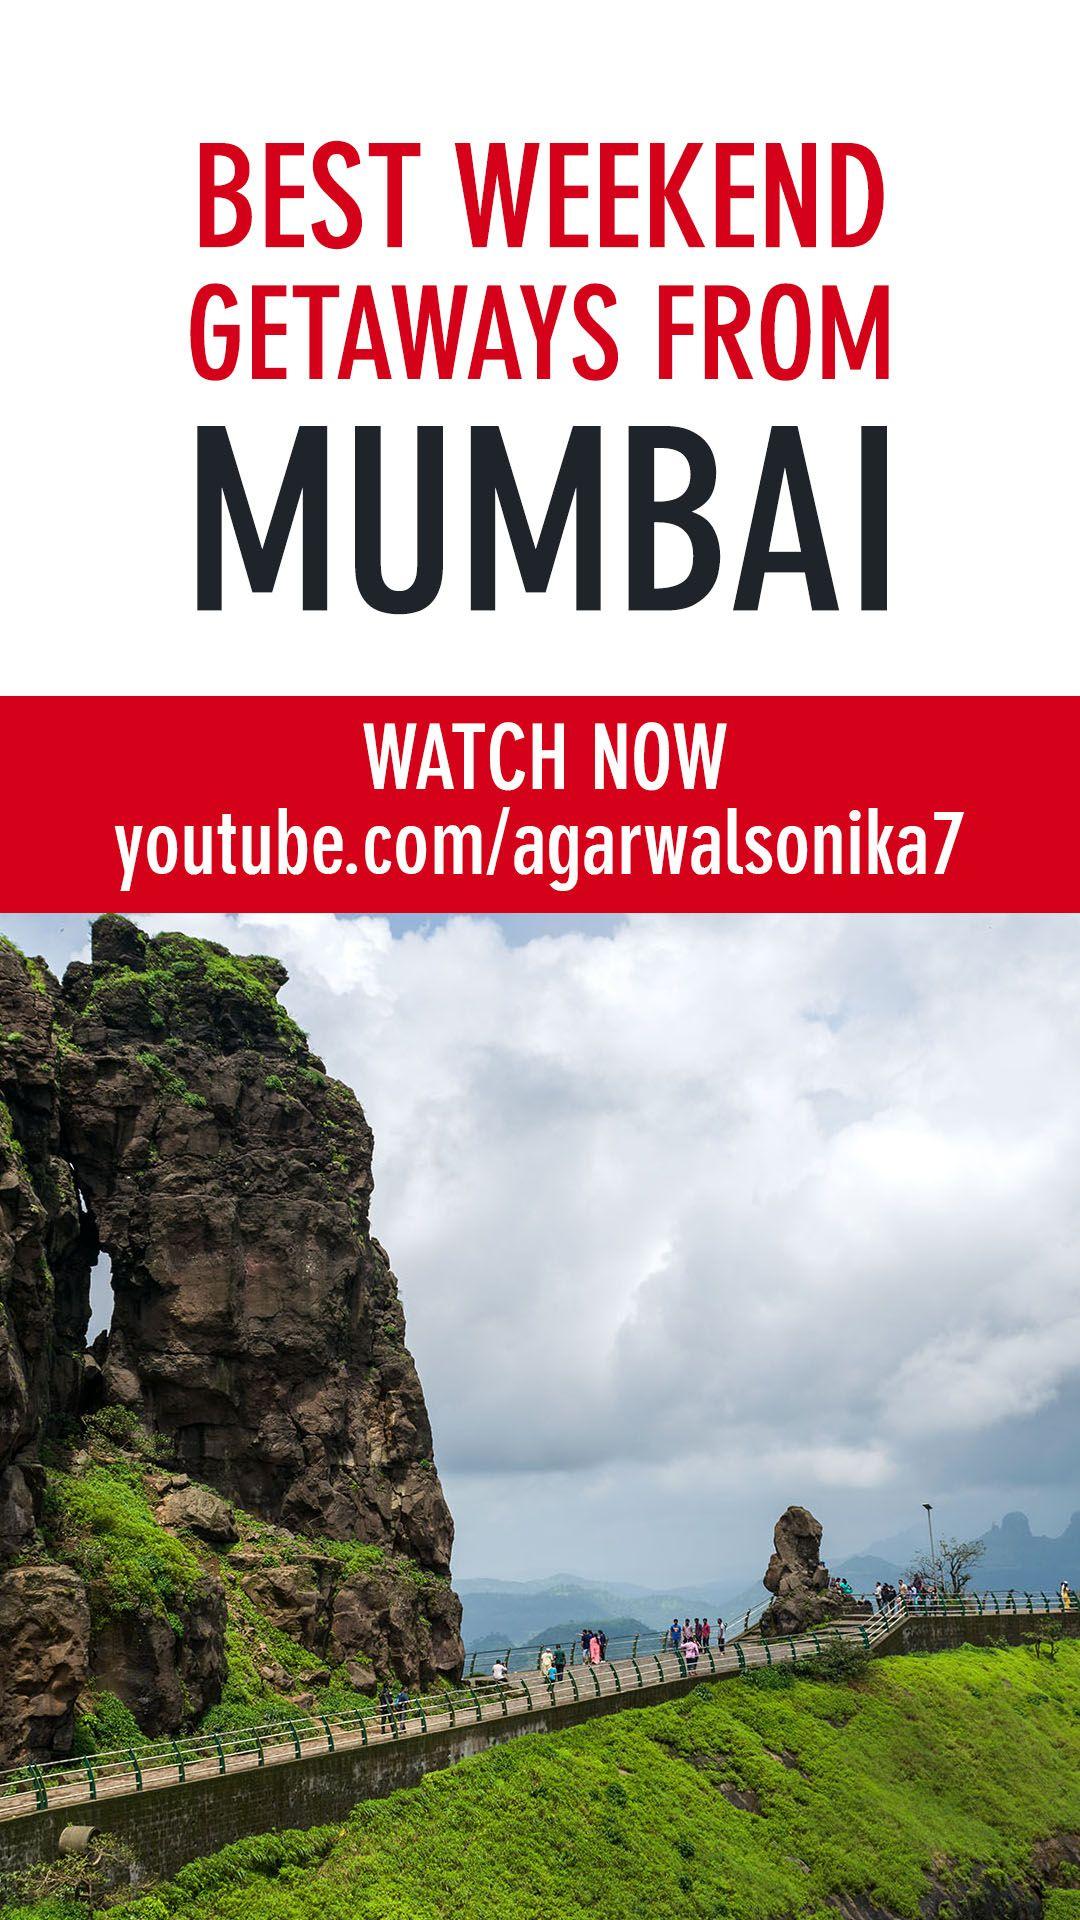 Top 10 Weekend Getaways Near Mumbai Here is my new travel